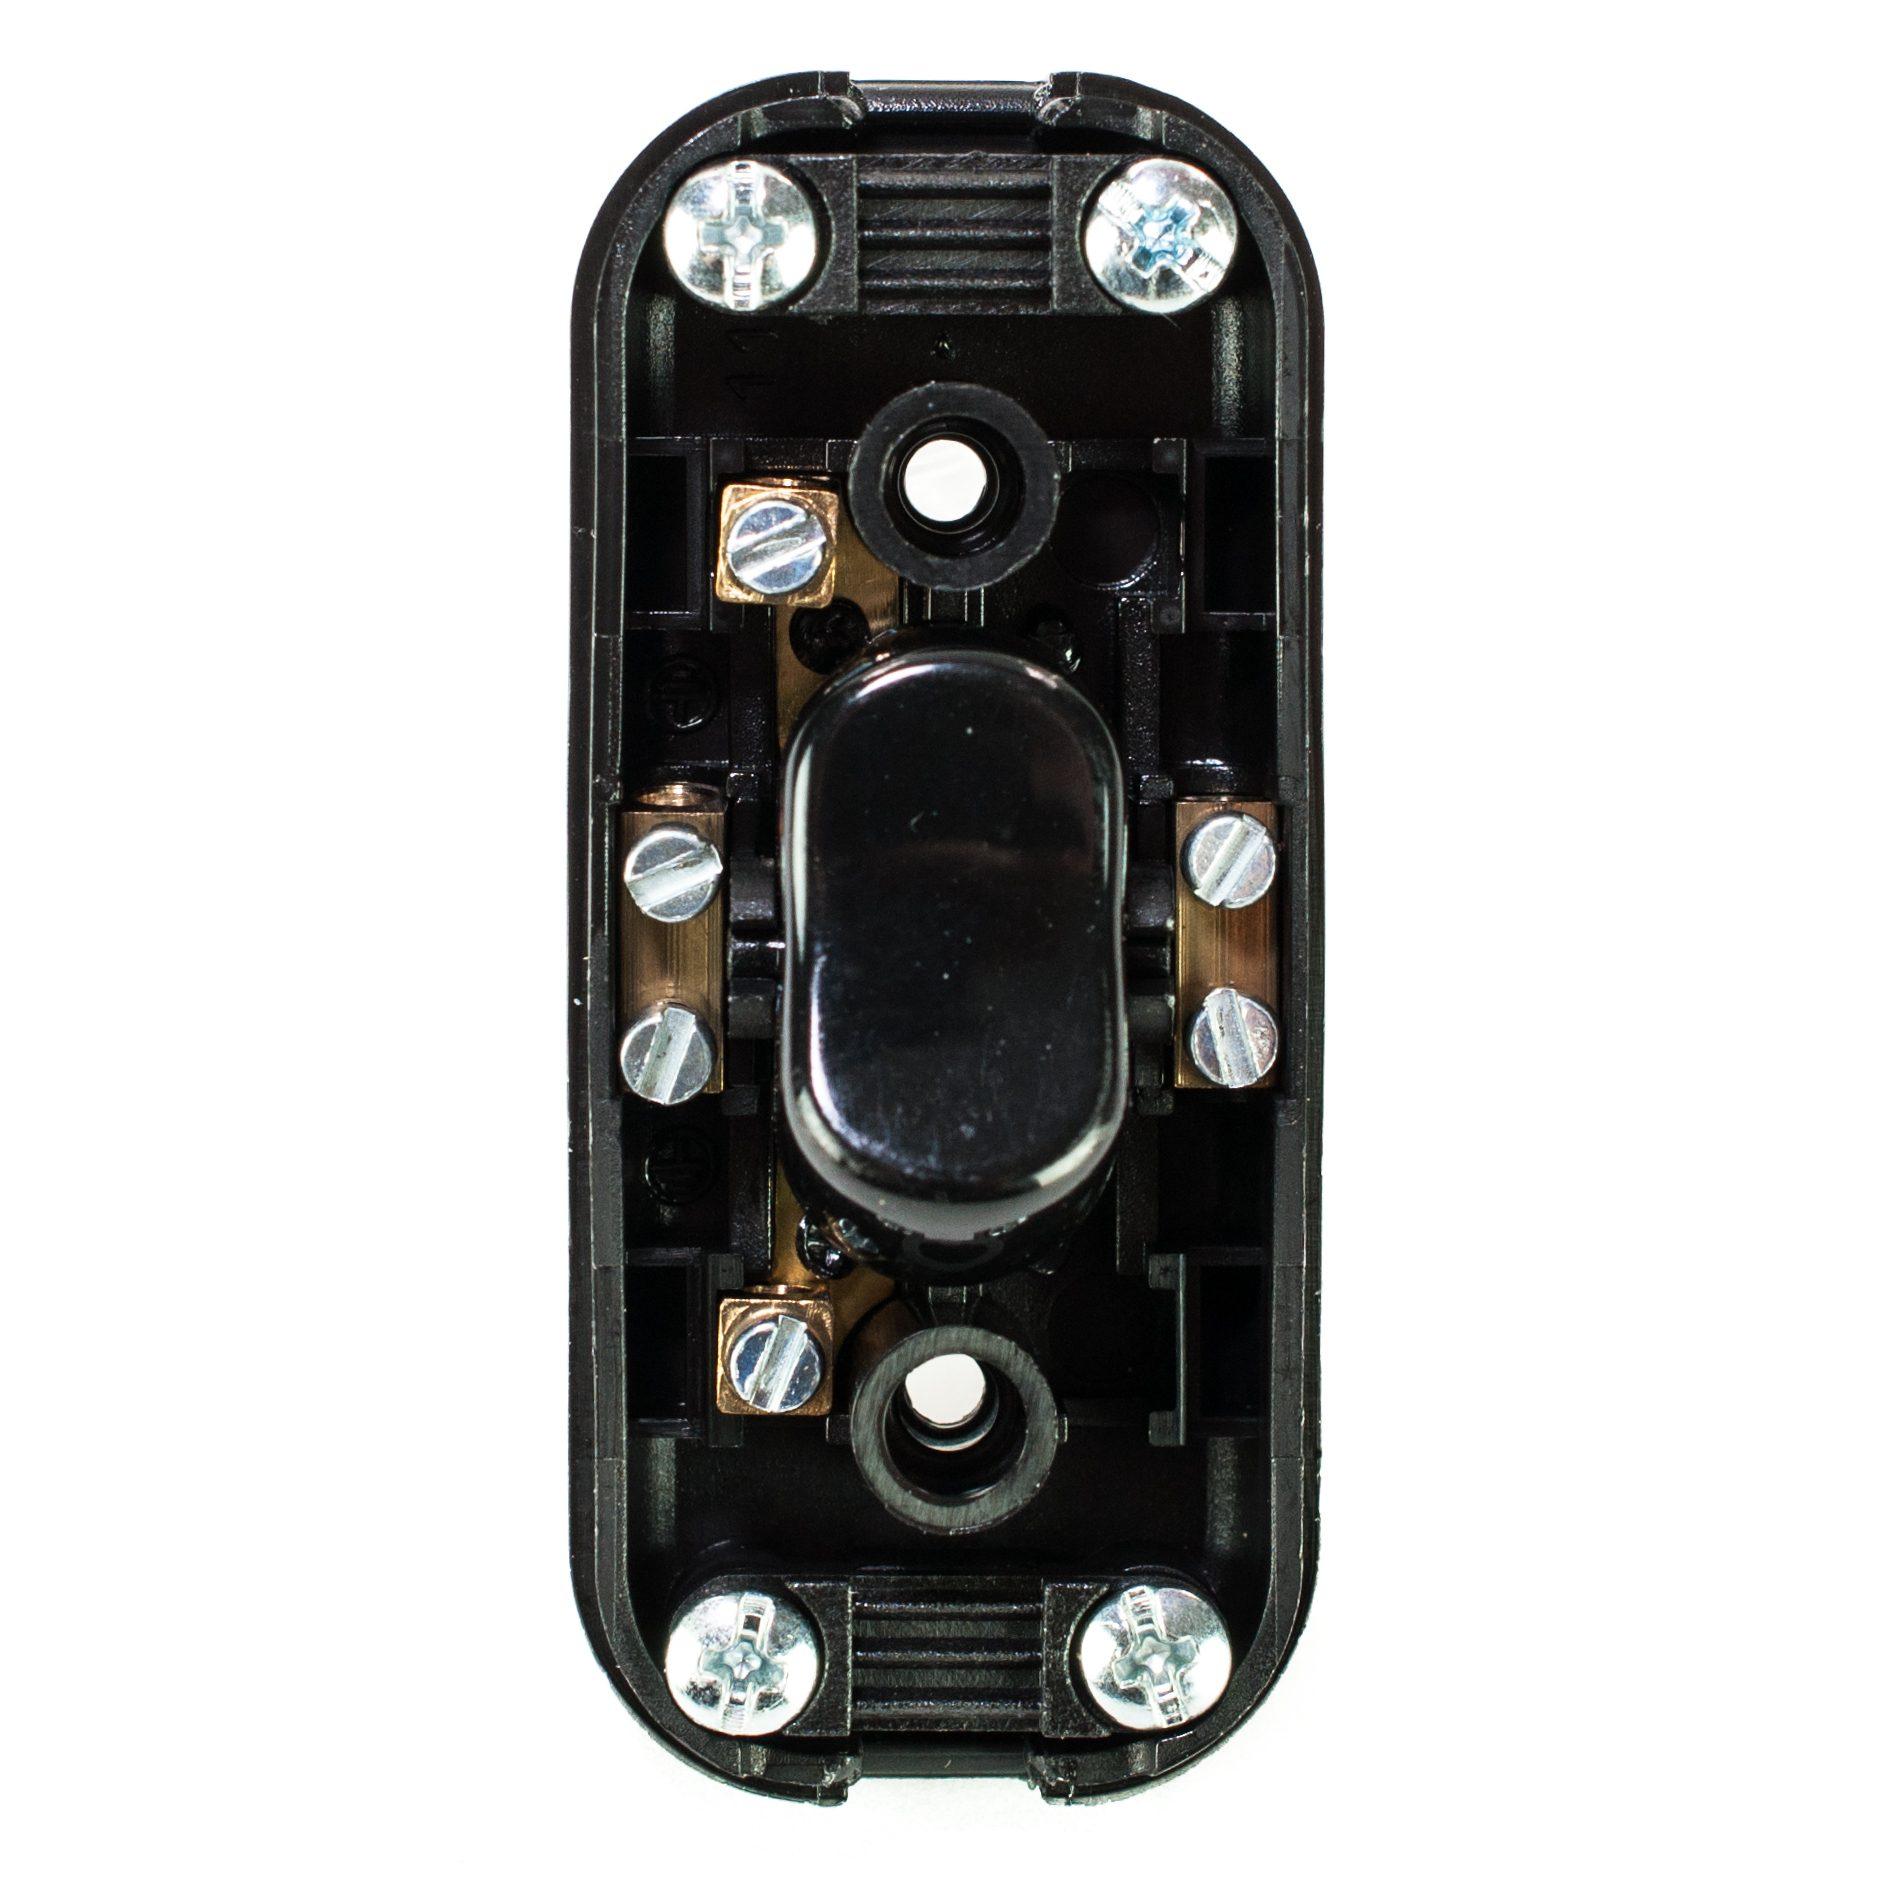 schnurschalter 1 pol 250v 2a f r 2 und 3 adrige kabel wei lightstock. Black Bedroom Furniture Sets. Home Design Ideas